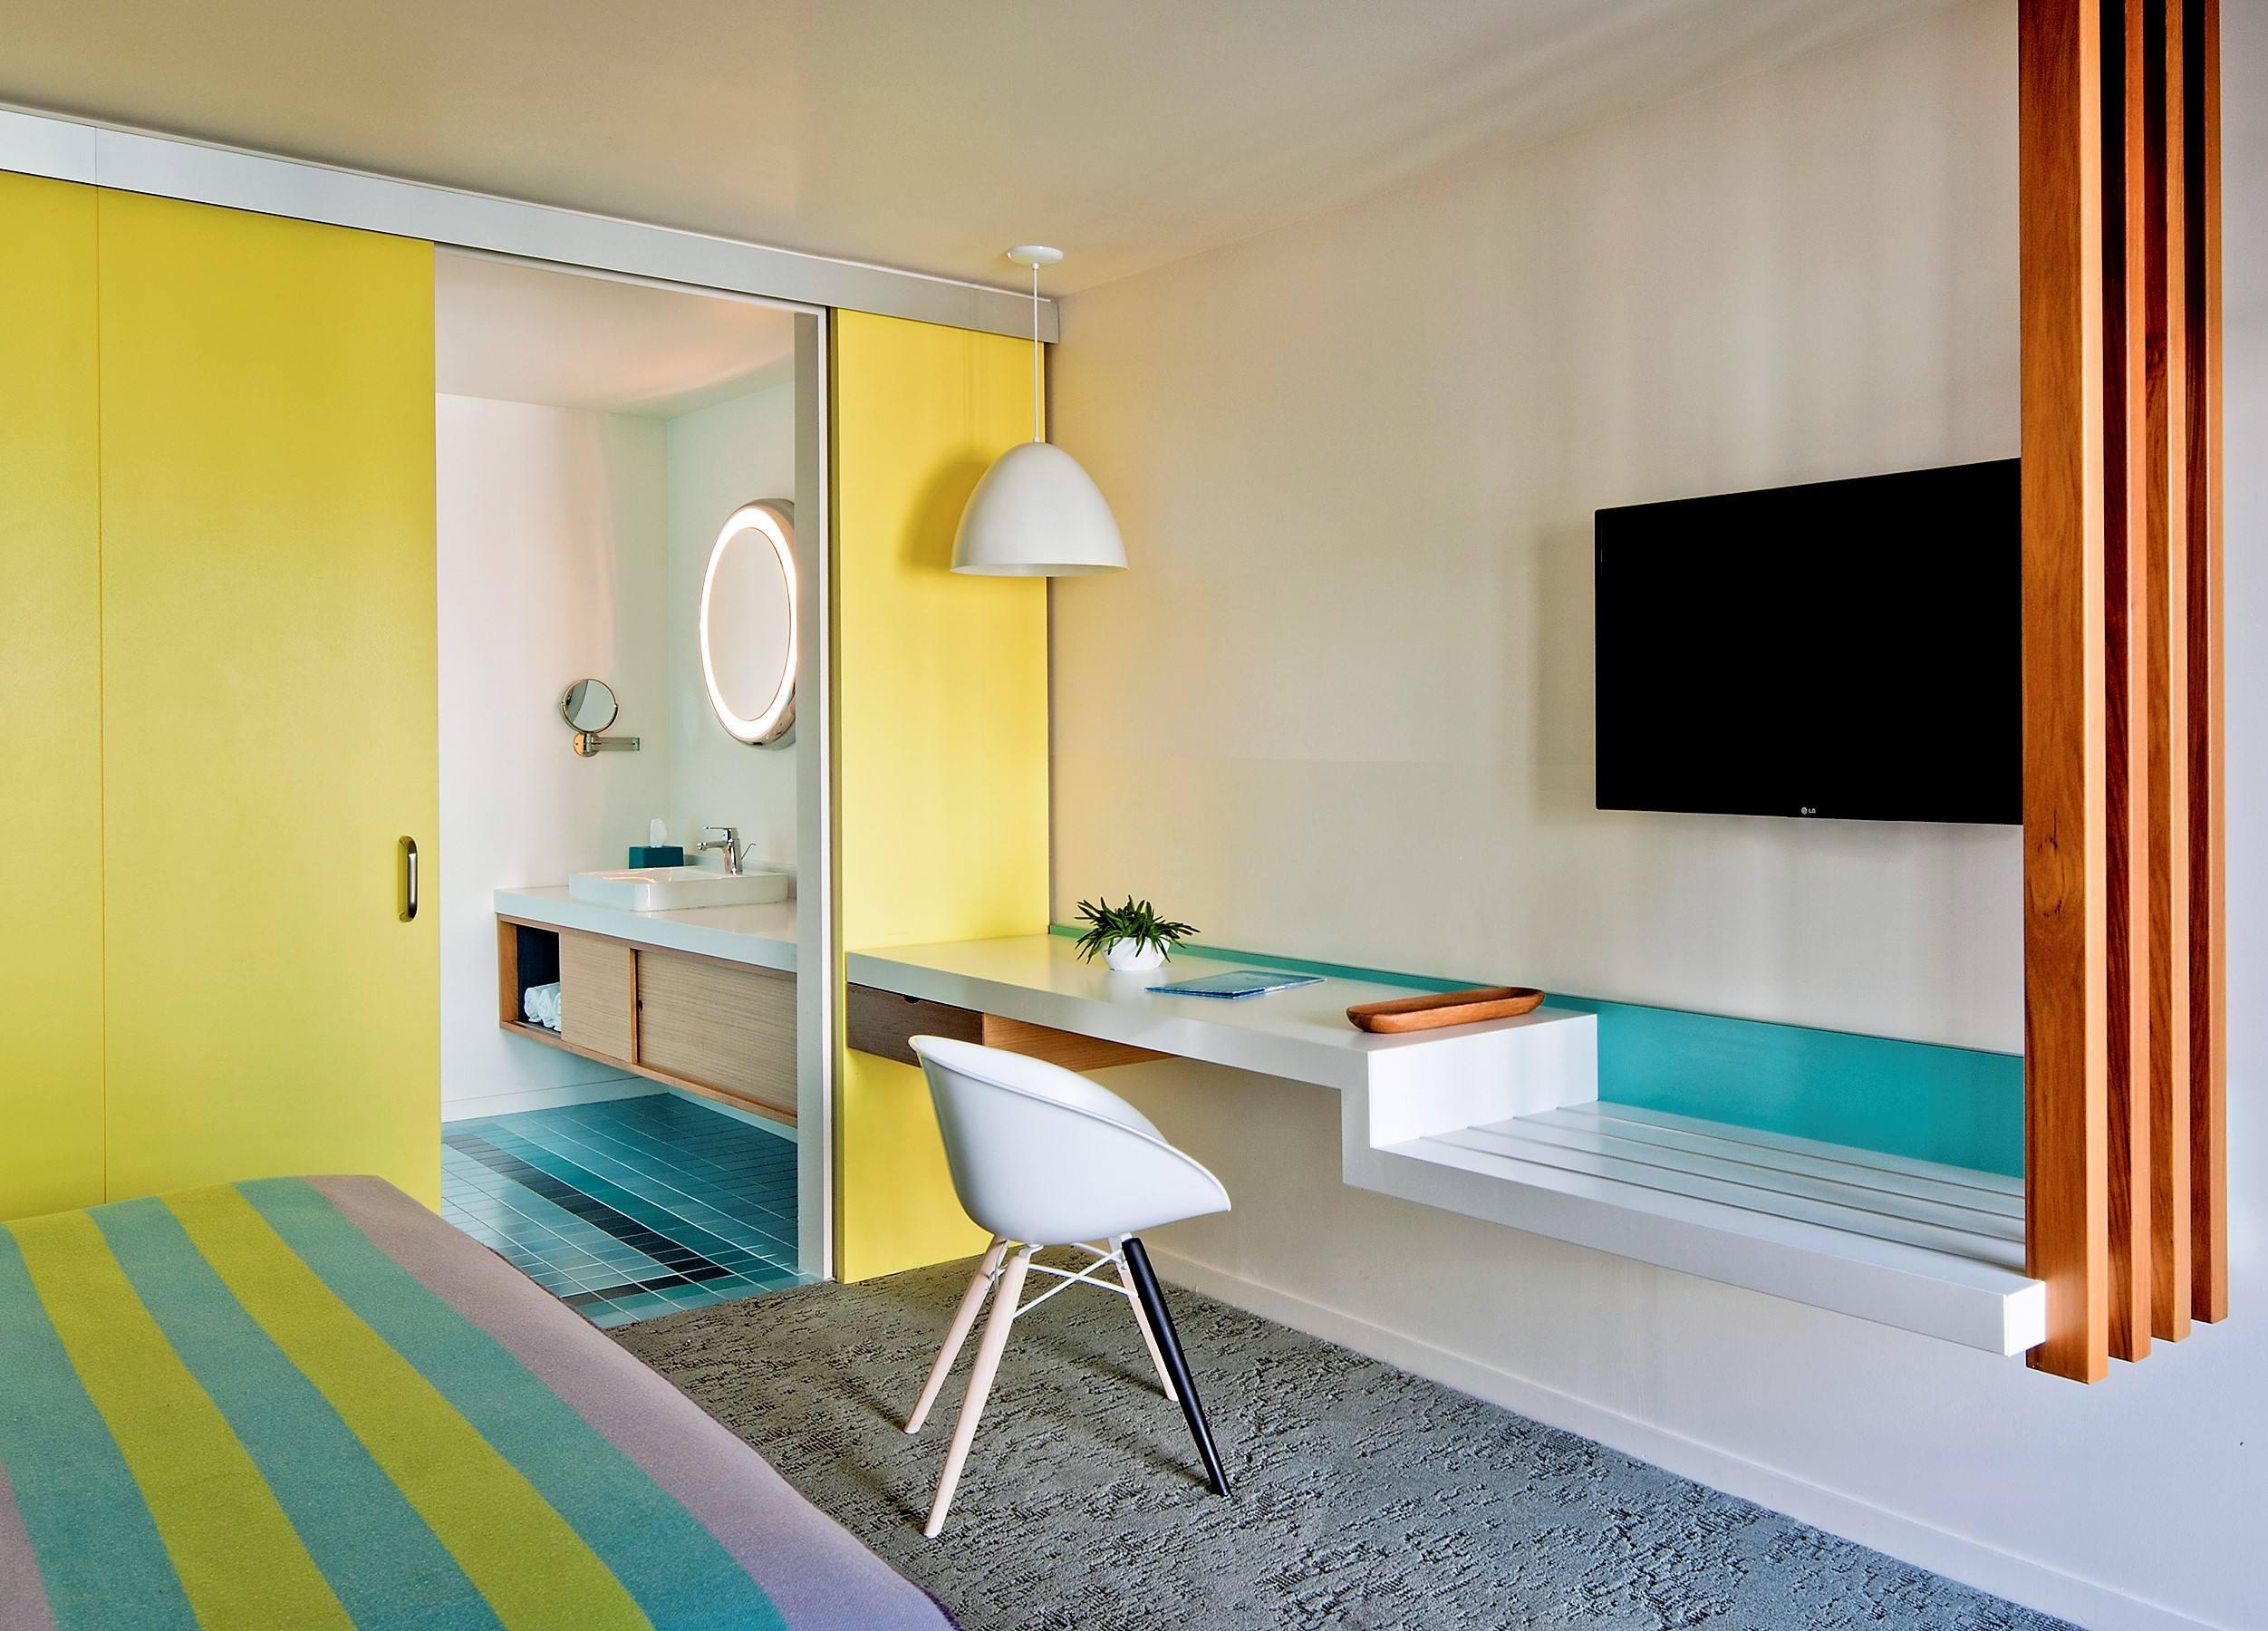 Standard King Room at the Beverly Laurel Motor Hotel